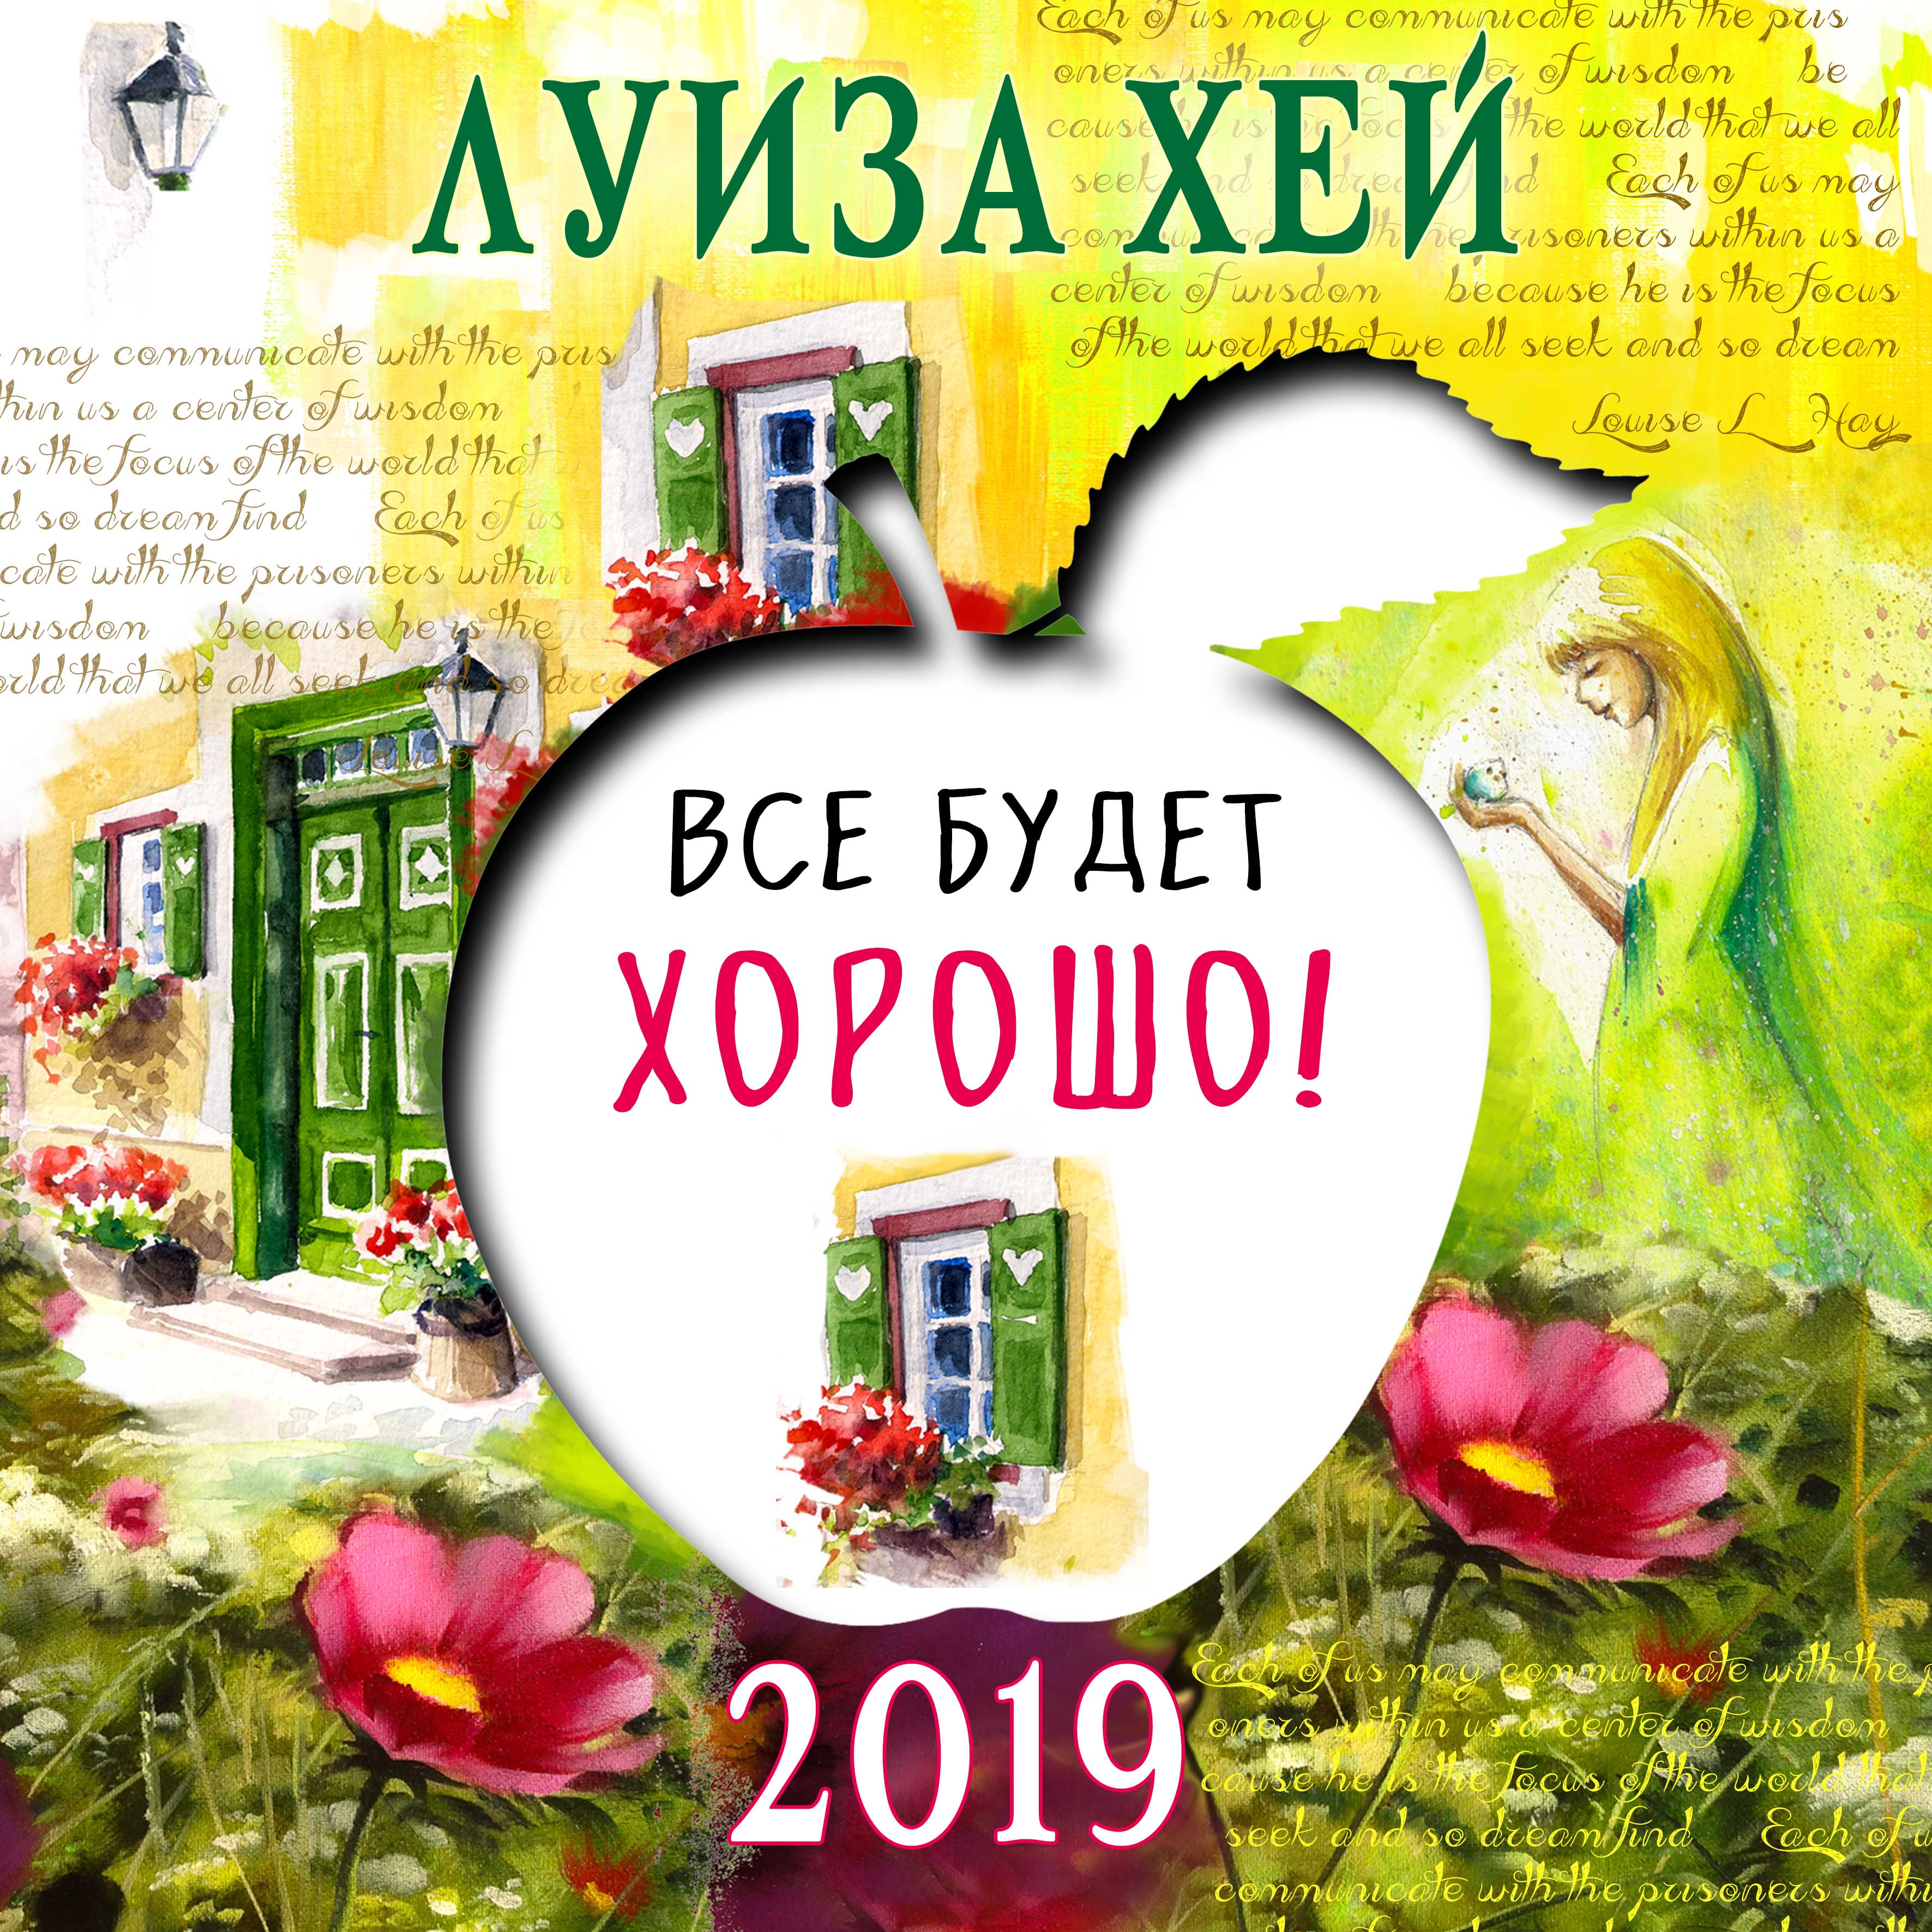 Хей Л. Календарь Все будет хорошо. Луиза Хей. 2019 ISBN: 978-5-04-093792-9